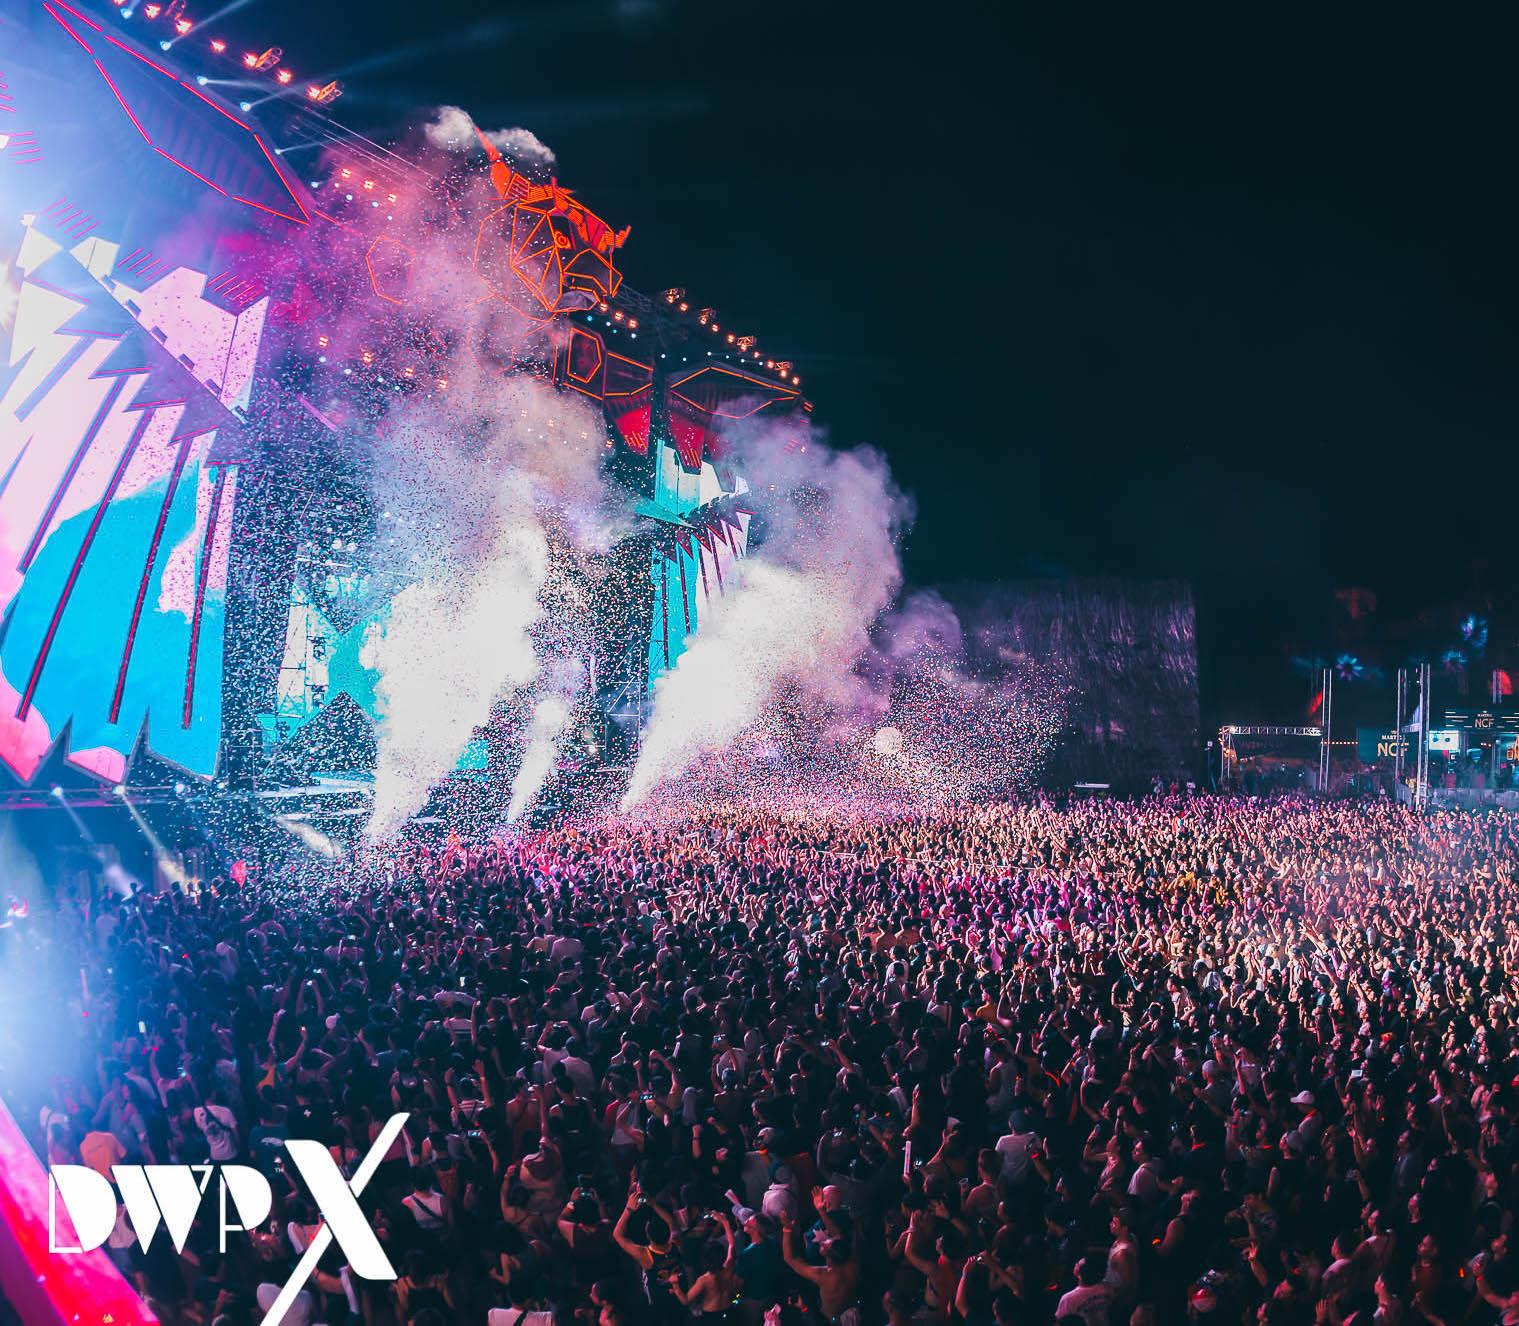 DWP - Best Music Festivals in Bali